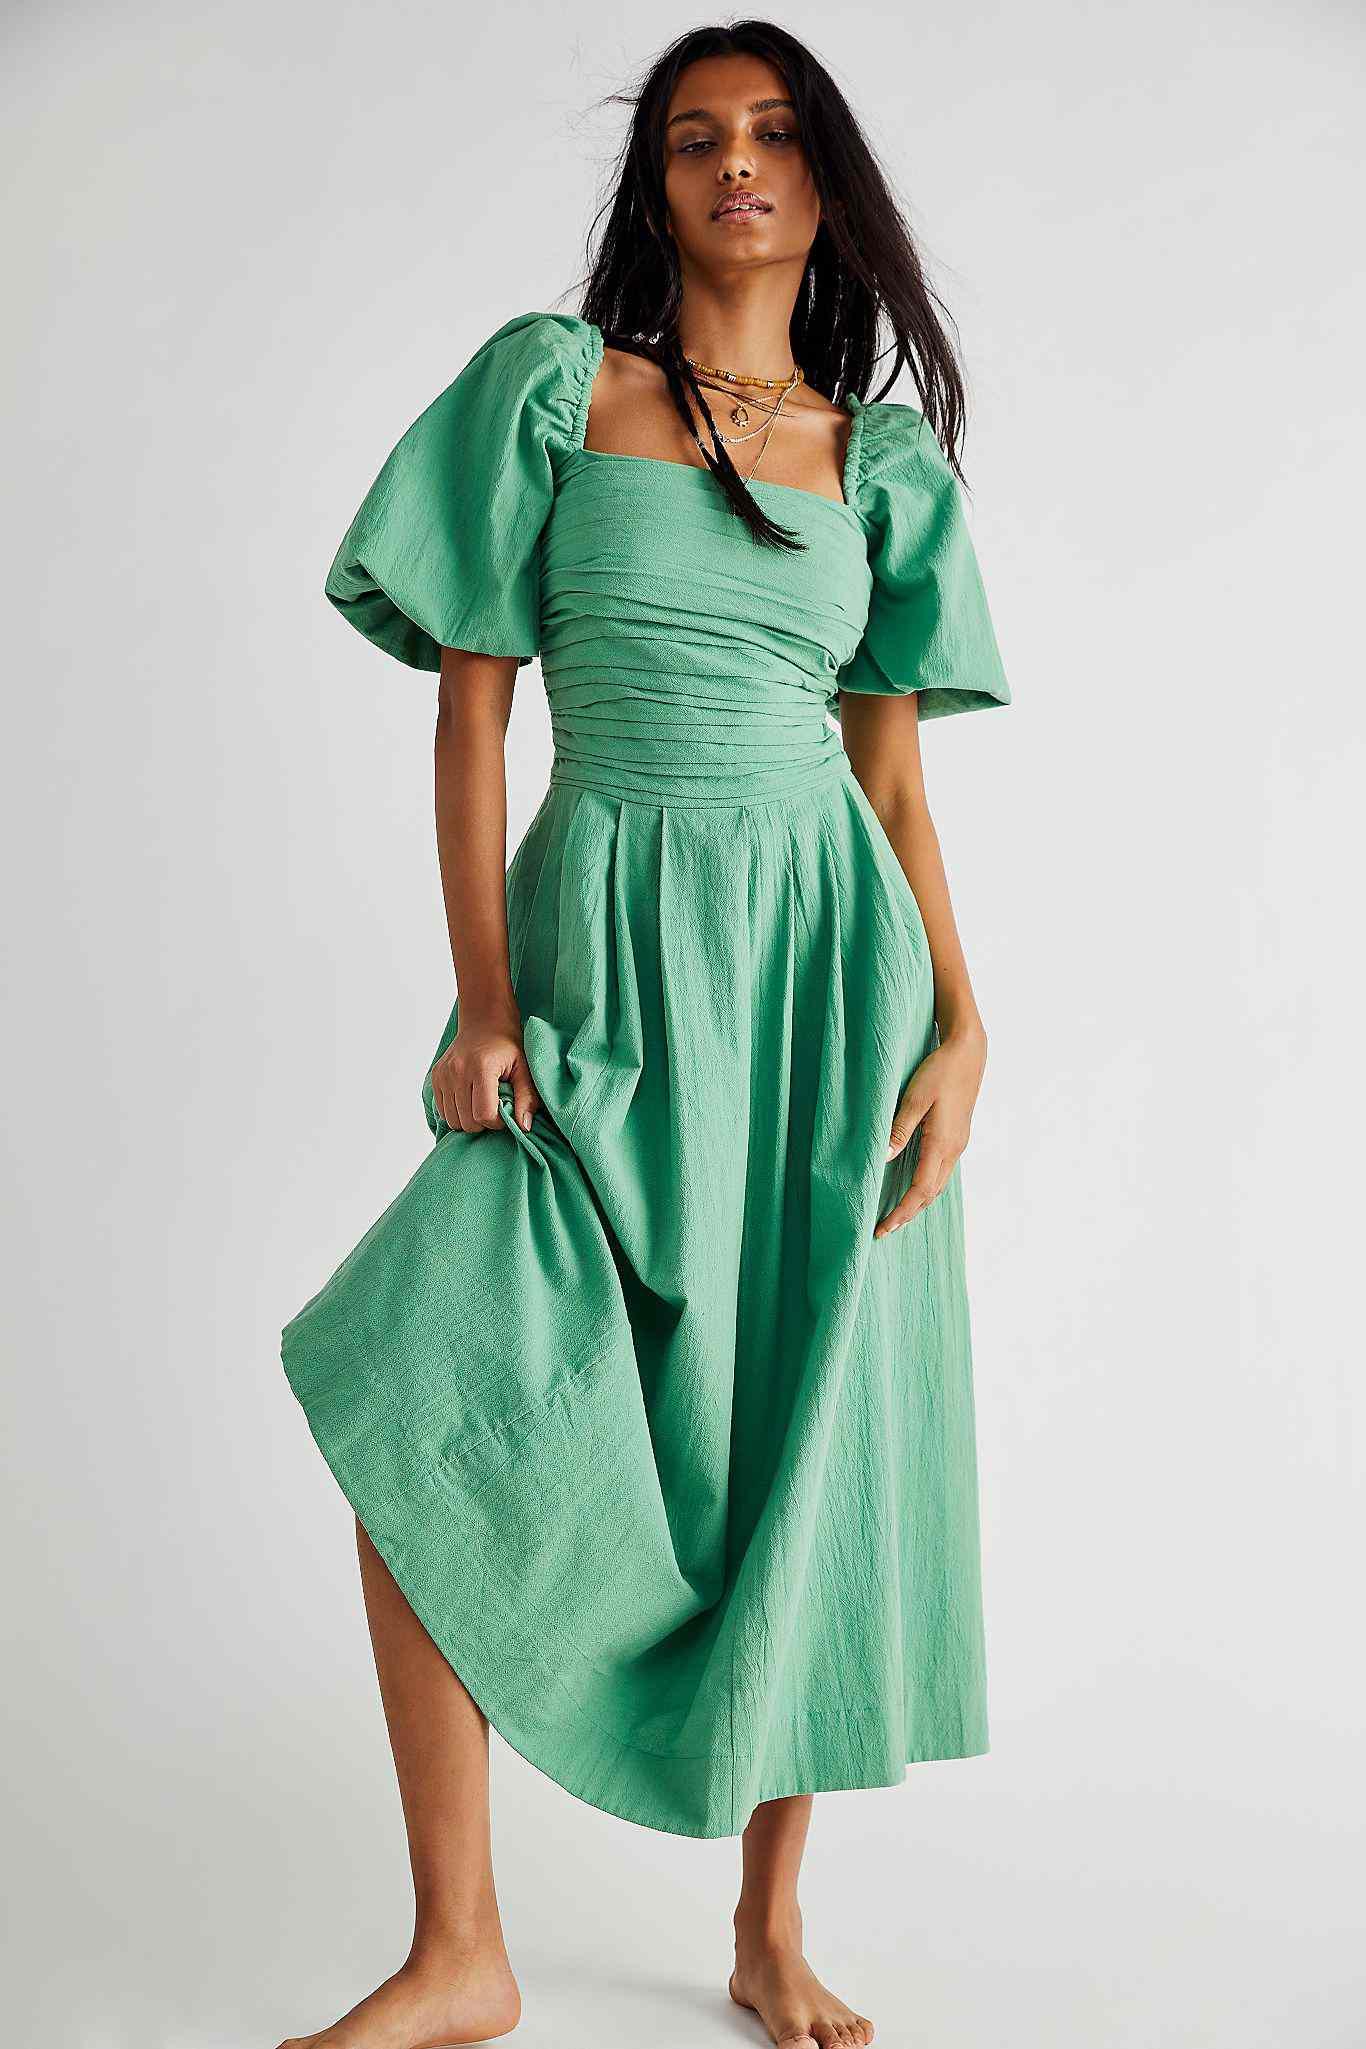 Endless Summer Ain't She A Beaut Midi Dress $118